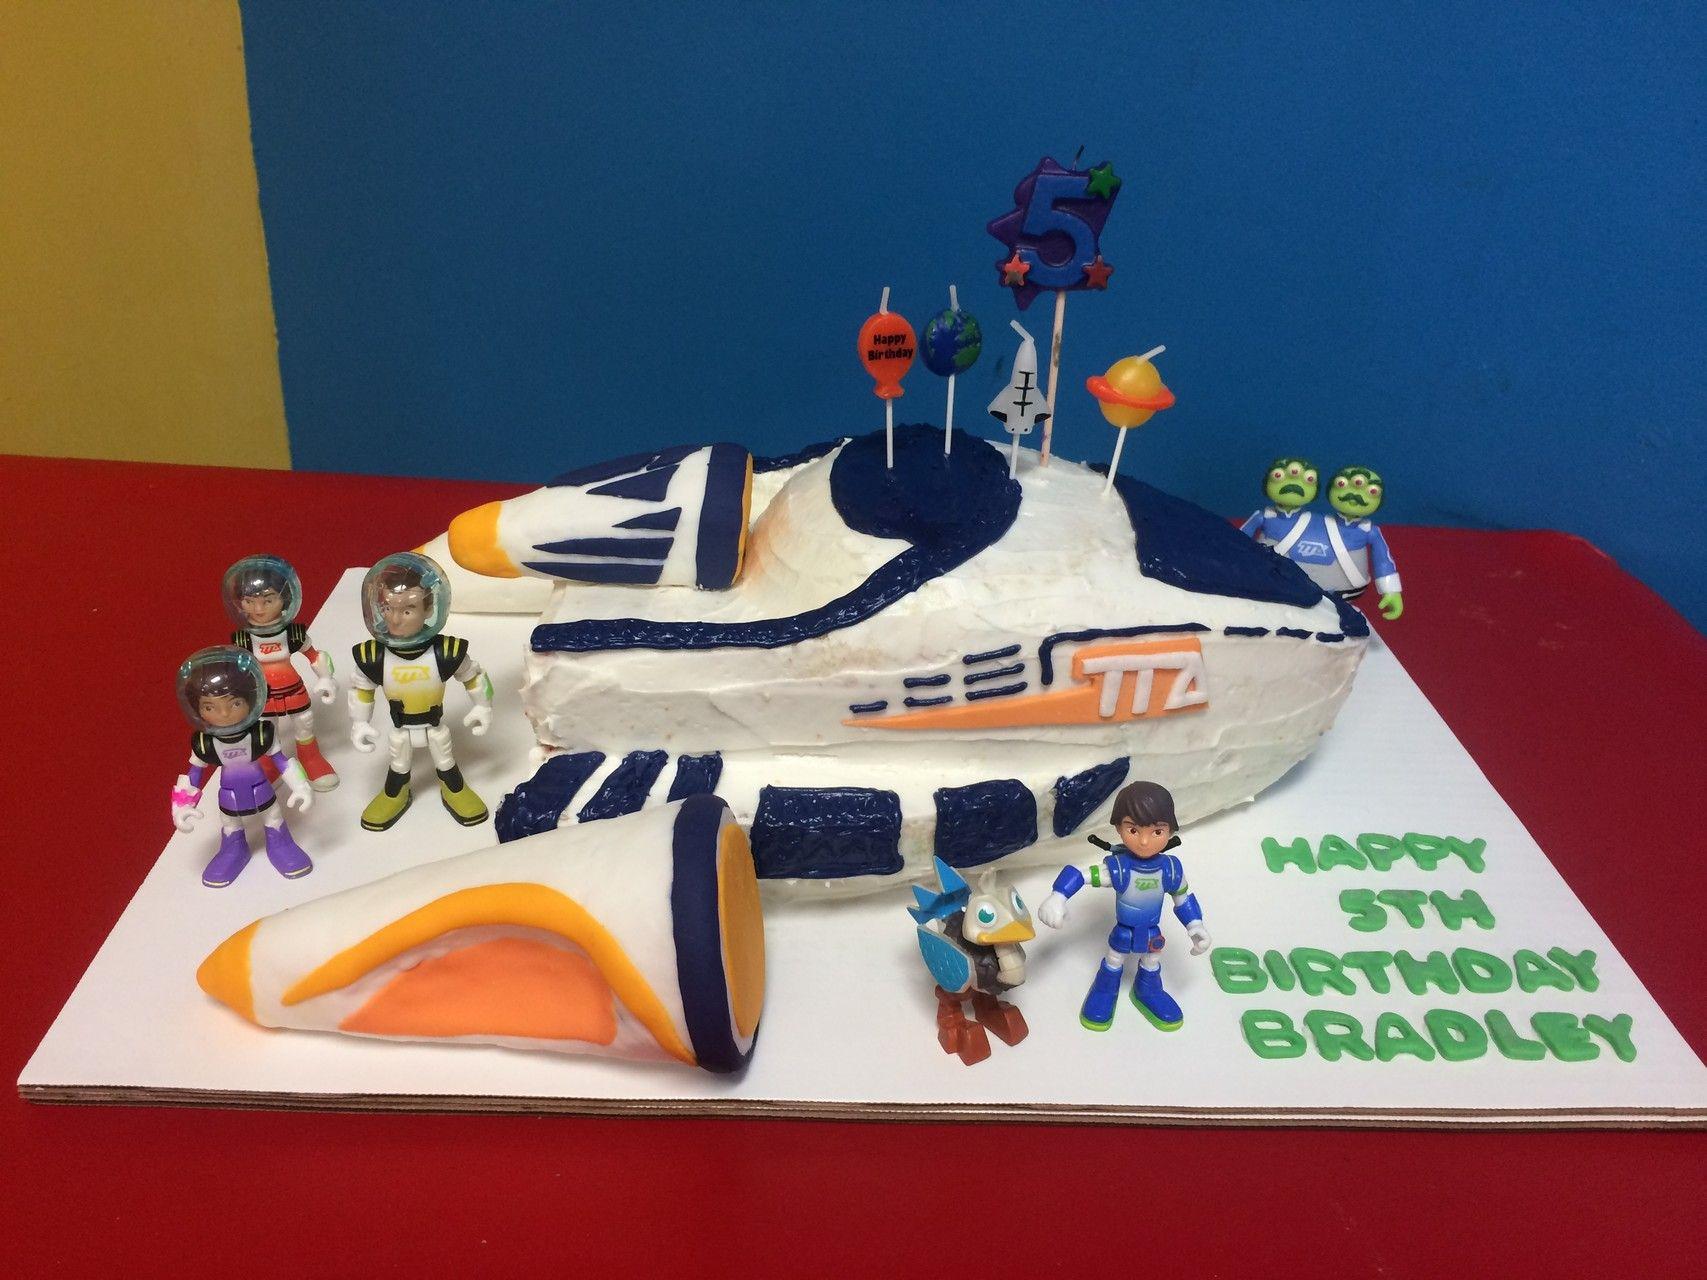 Miles from Tomorrowland Stellosphere birthday cake